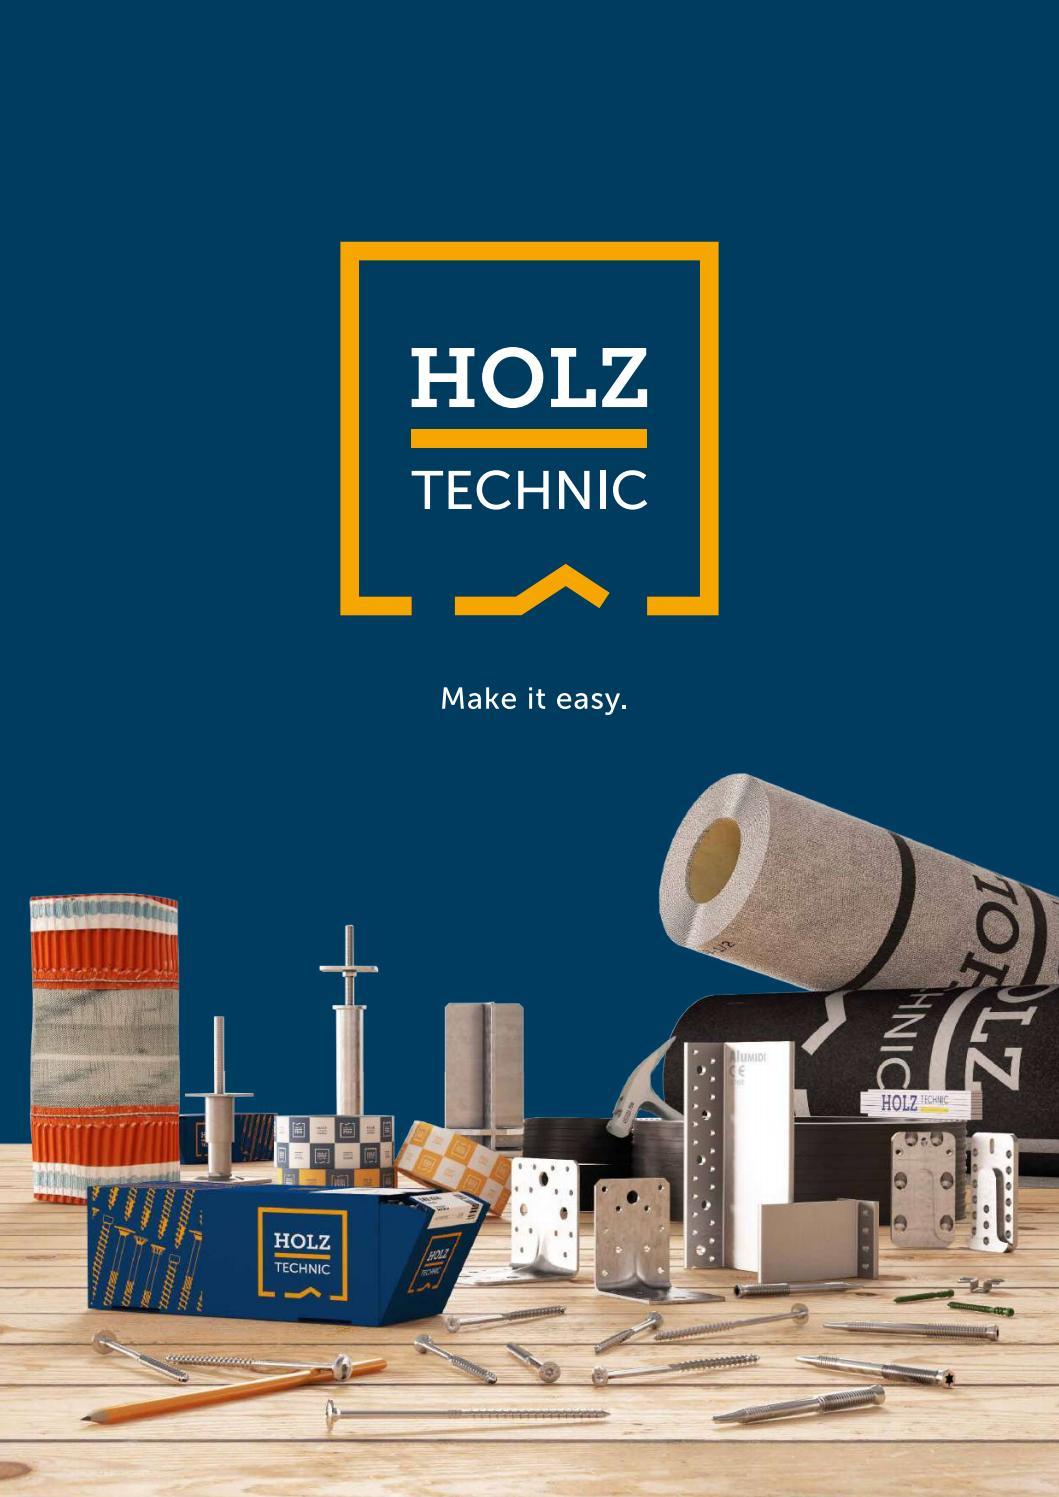 catalogo holz technic 2019 de fr by